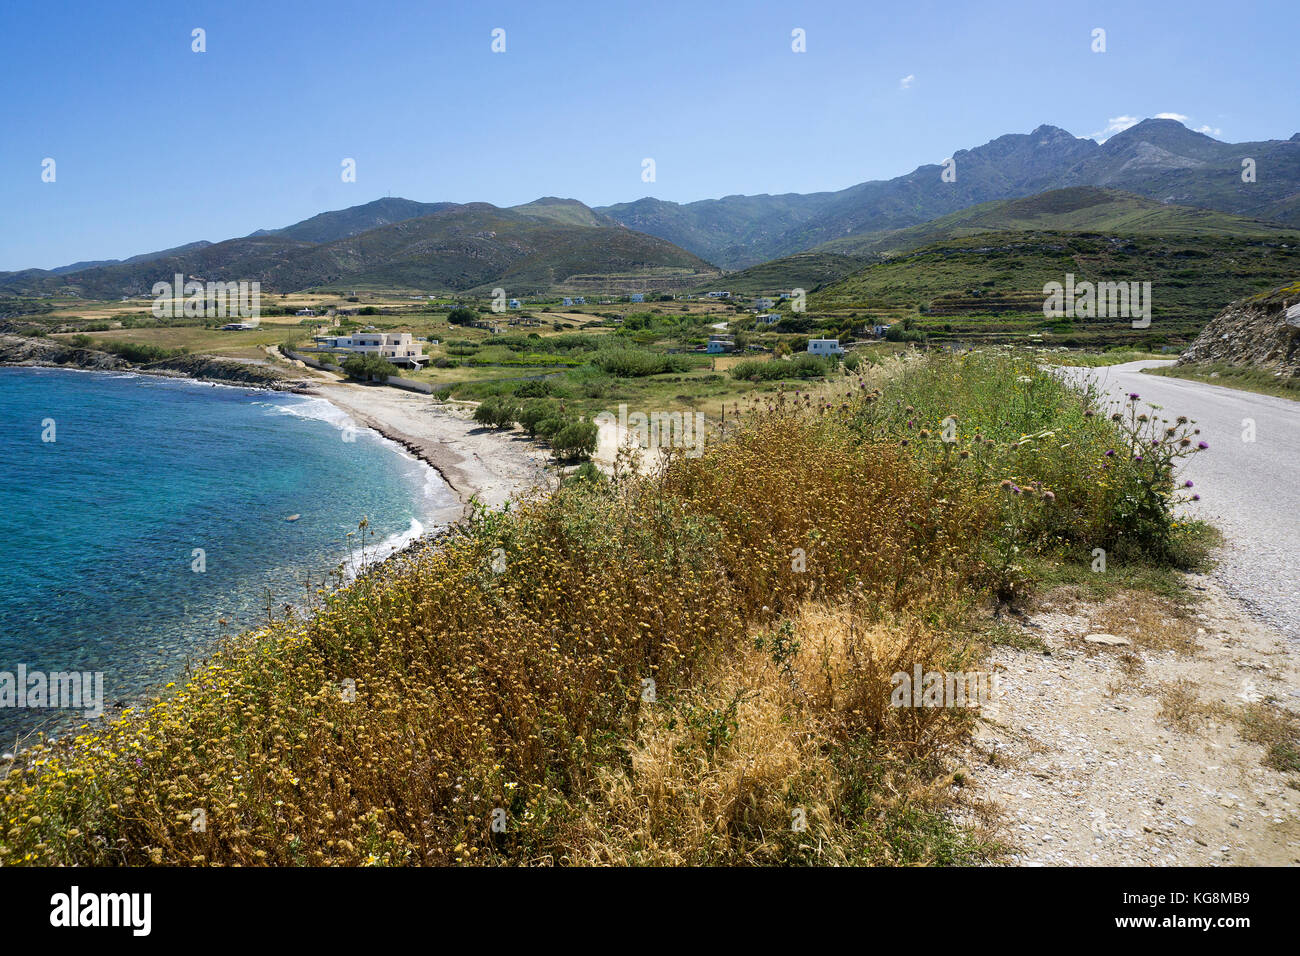 Amitis beach, north side of Naxos island, Cyclades, Aegean, Greece - Stock Image